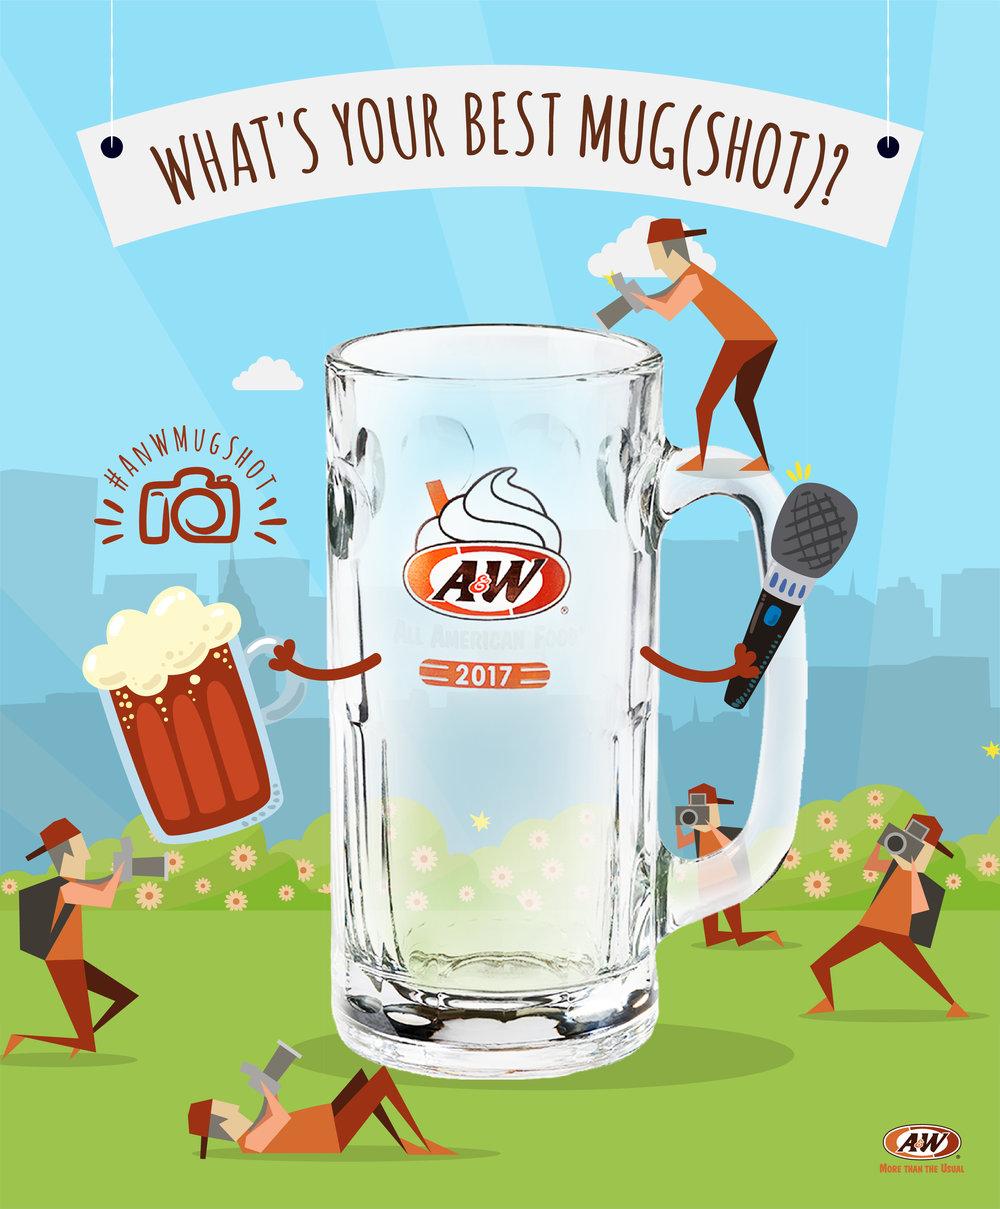 A&W_FB_Oct_RB Mug Campaign_for A&W-01.jpg